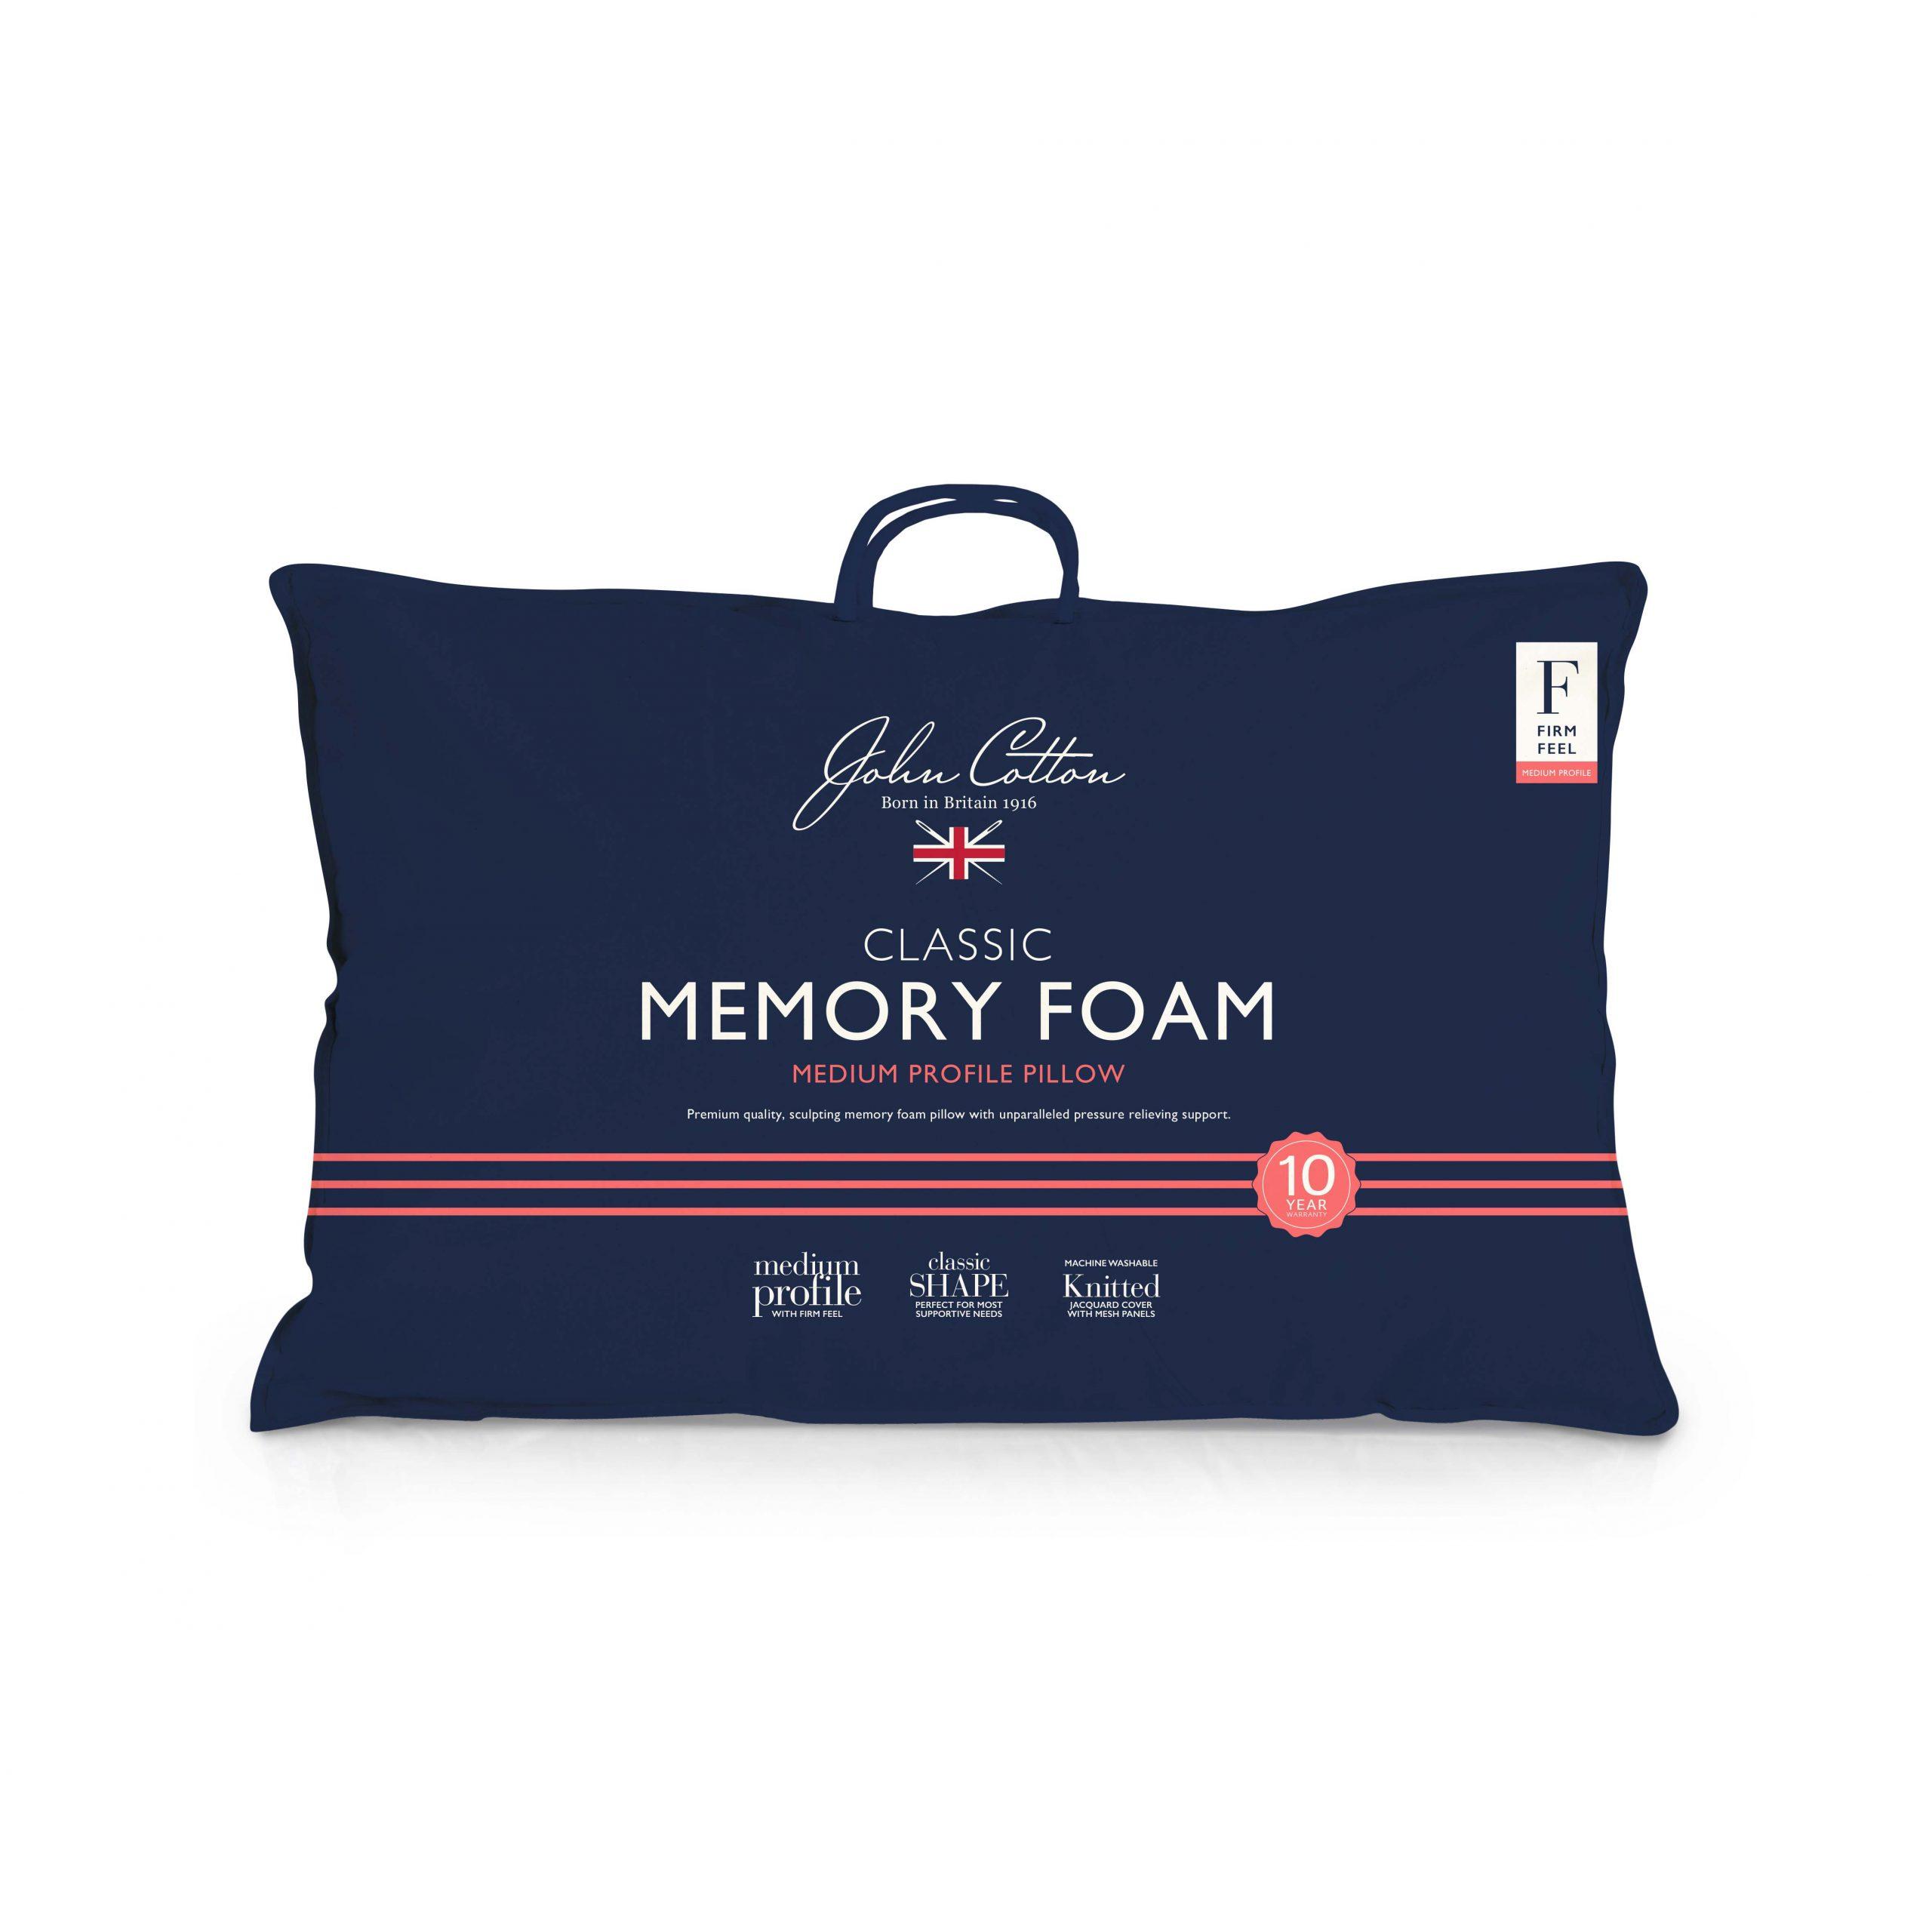 John Cotton Medium Profile Memory Foam Pillow